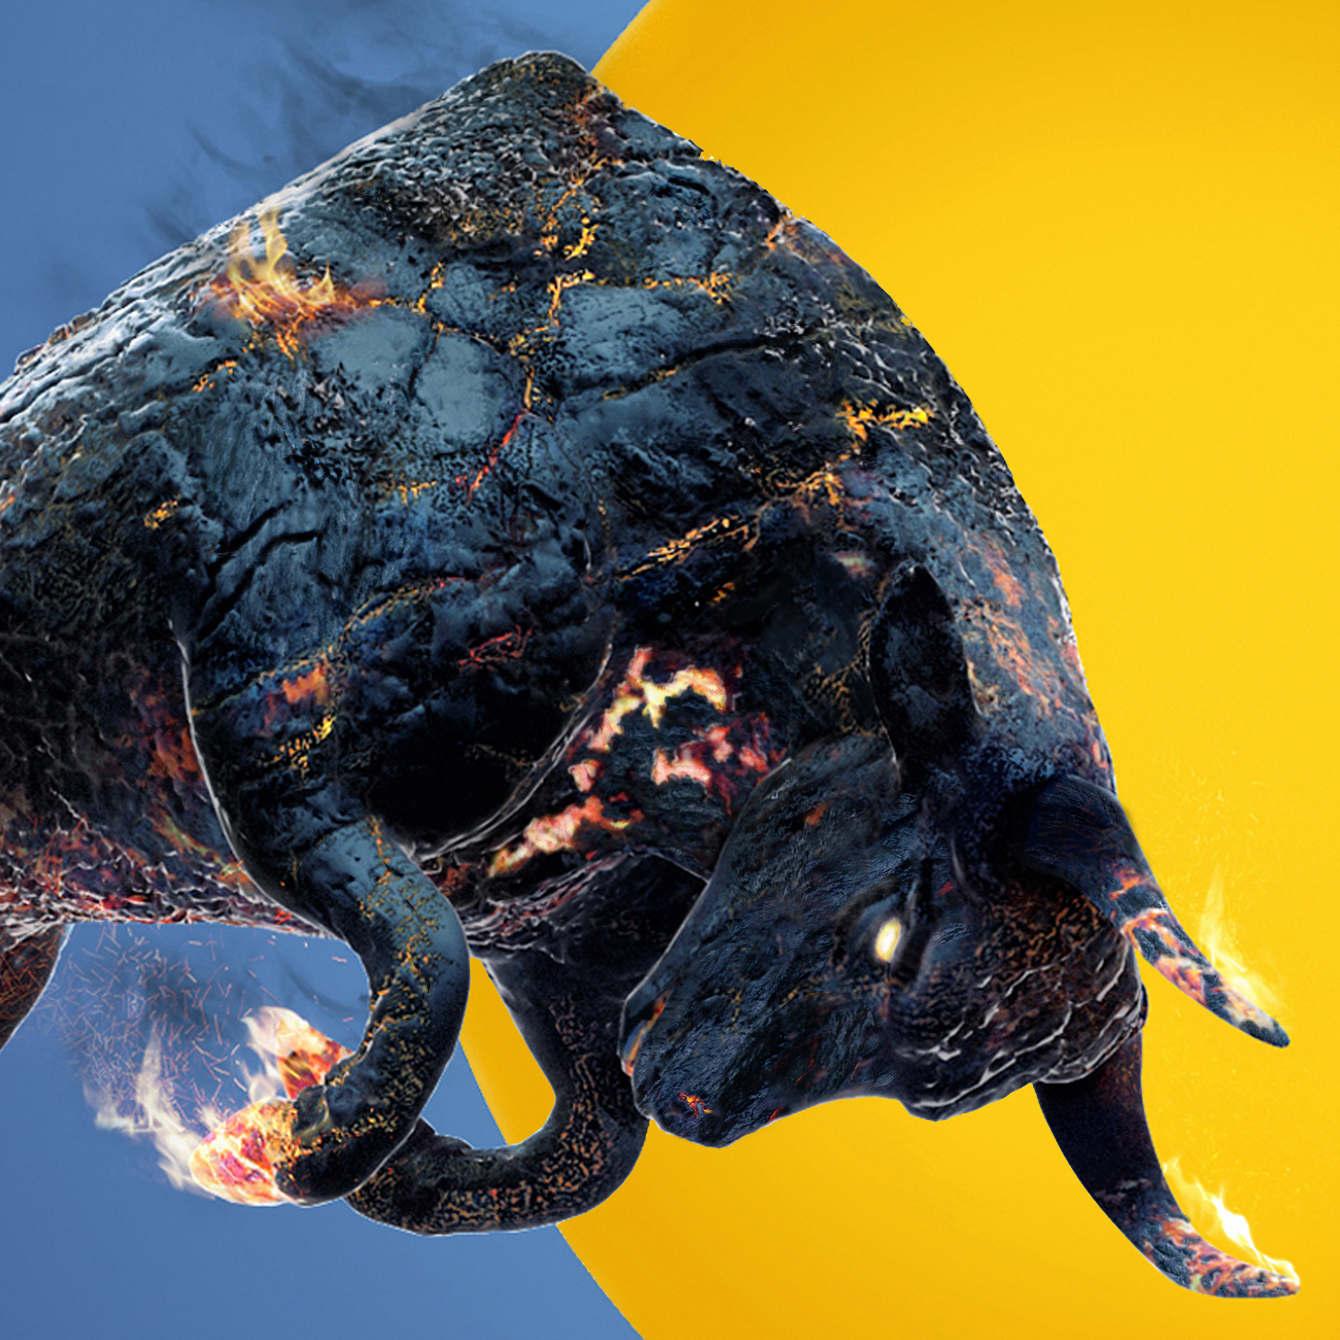 Red-Bull-brand-development-closeup-lava_1340_c.jpg